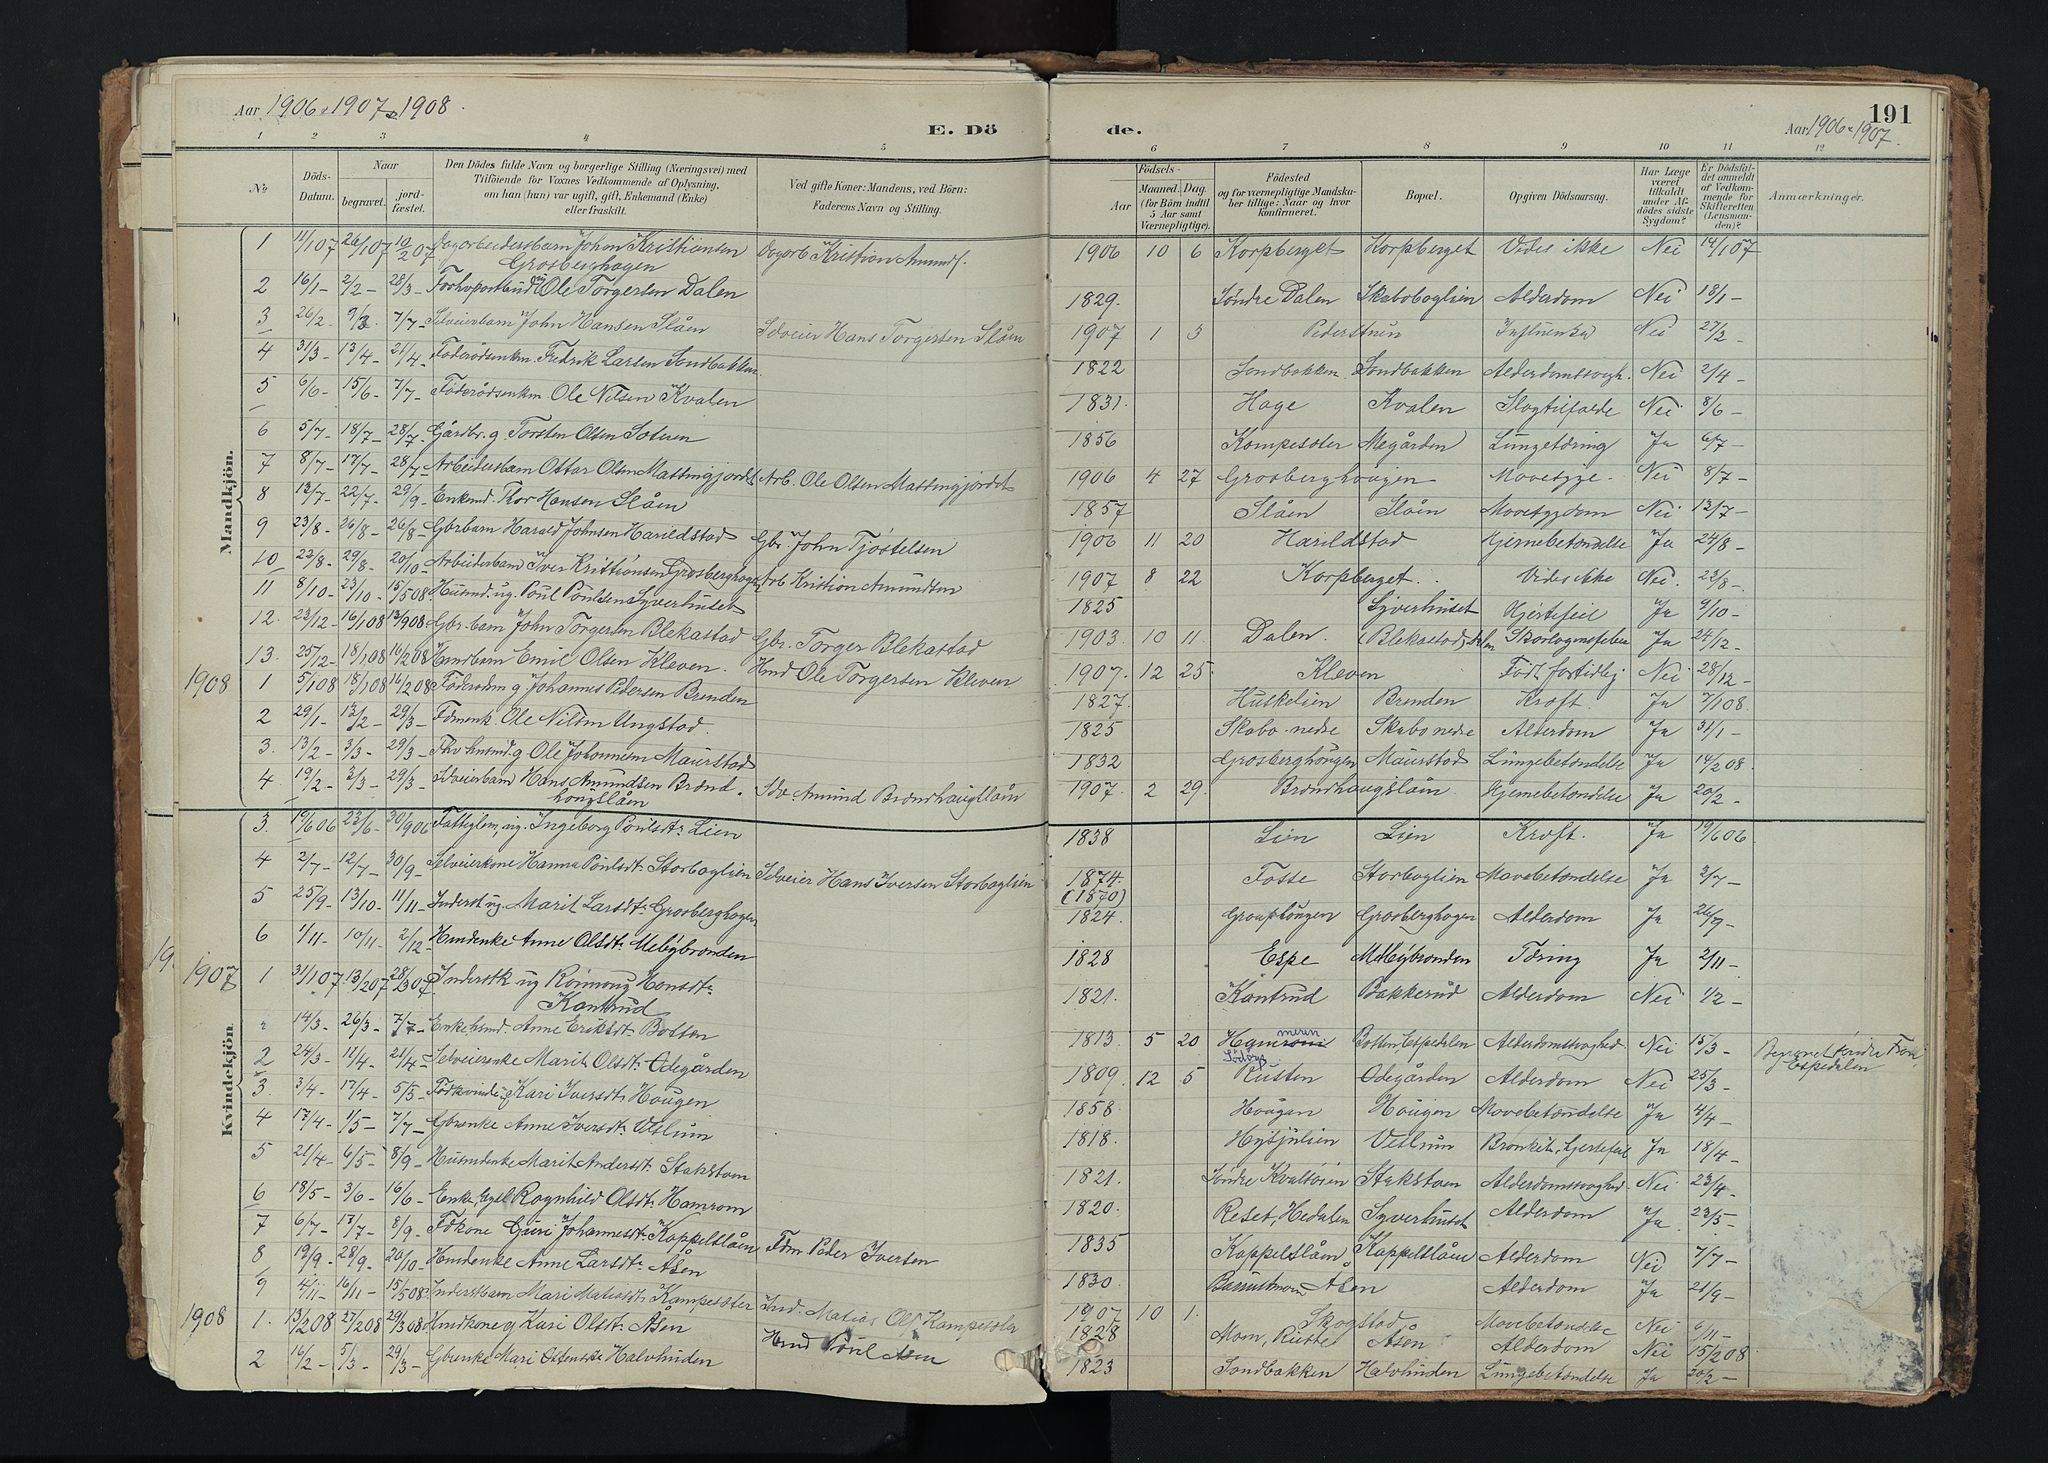 SAH, Nord-Fron prestekontor, Ministerialbok nr. 5, 1884-1914, s. 191